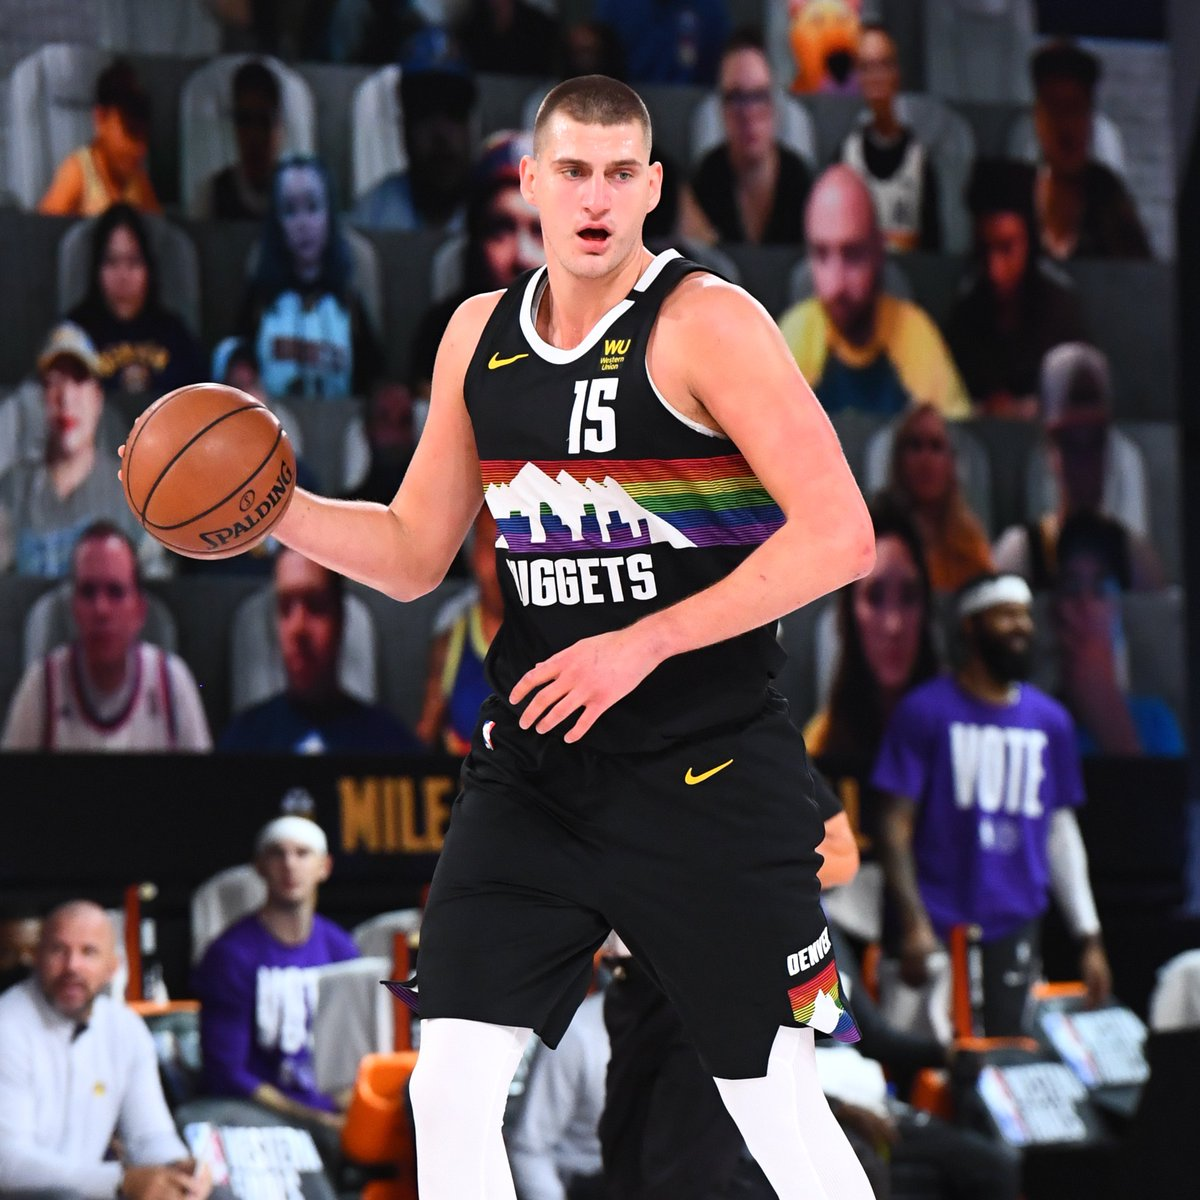 Game 3, through 1Q on TNT:  @nuggets 29 @Lakers 27  Nikola Jokic: 11 PTS, 4 REB LeBron James: 6 PTS, 5 AST https://t.co/L9bK8r4ckN